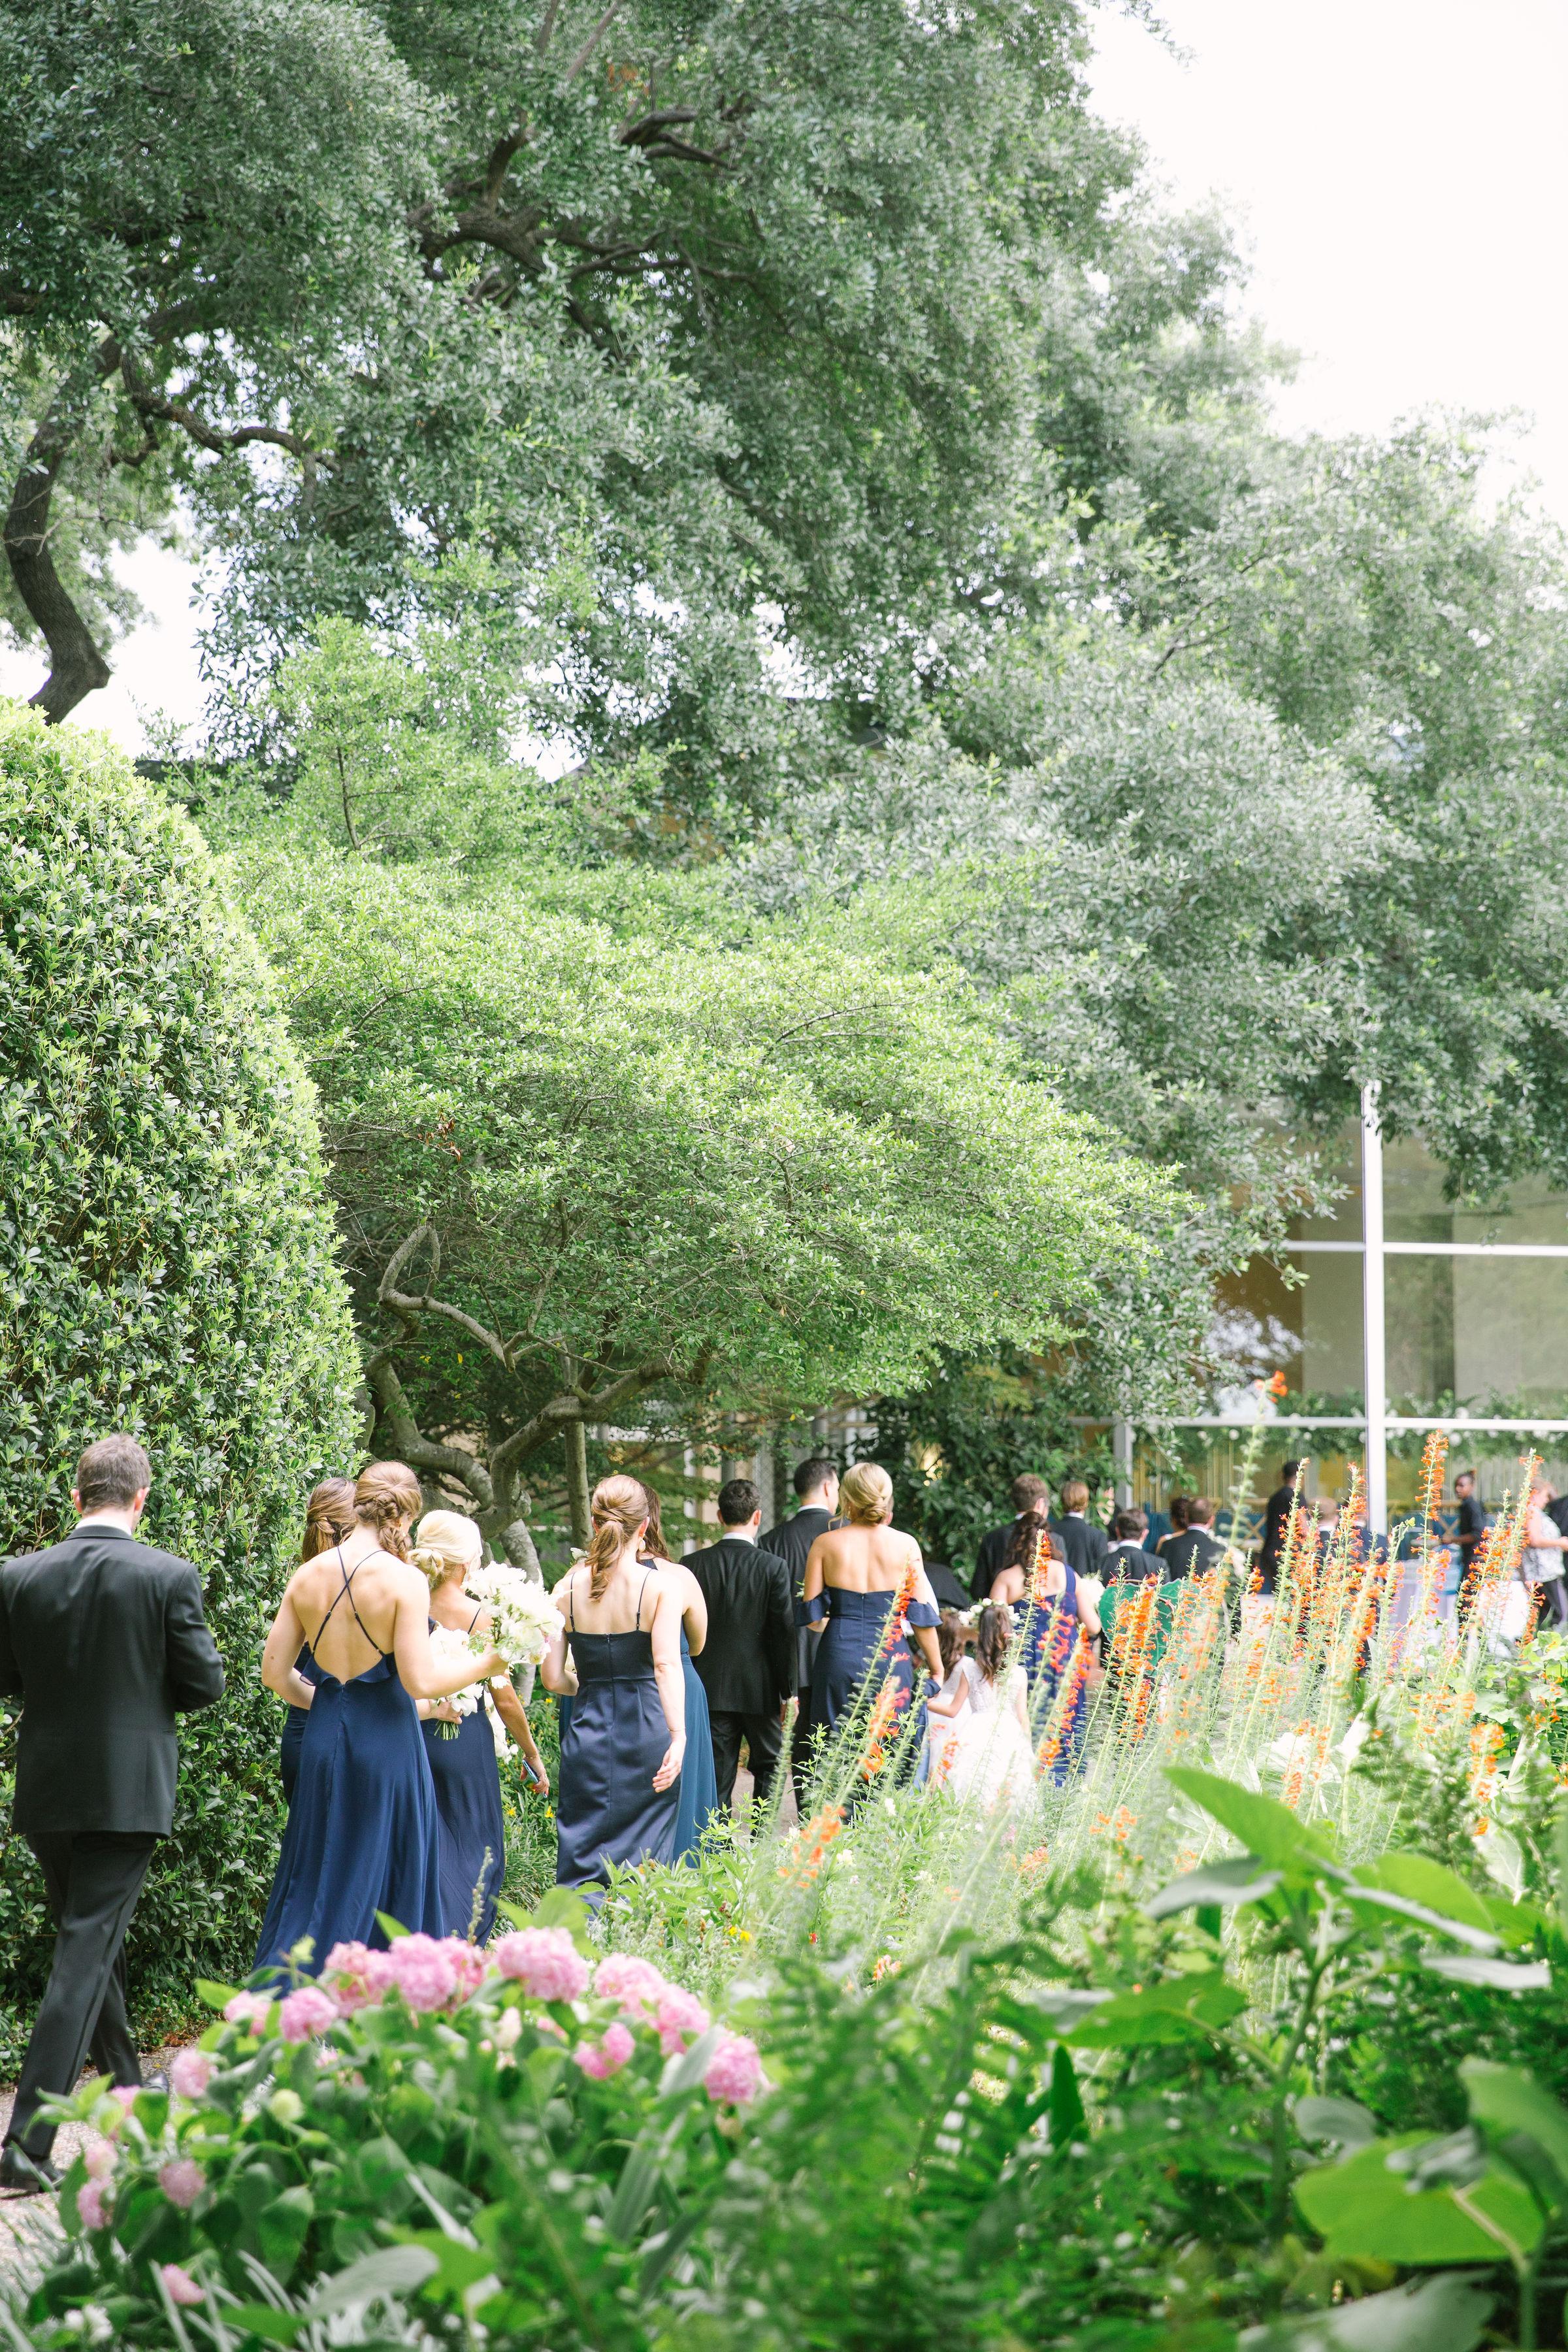 Ellen-Ashton-Photography-Dallas-Wedding-Photographers-Ivory-and-vine-Weddings-827.jpg